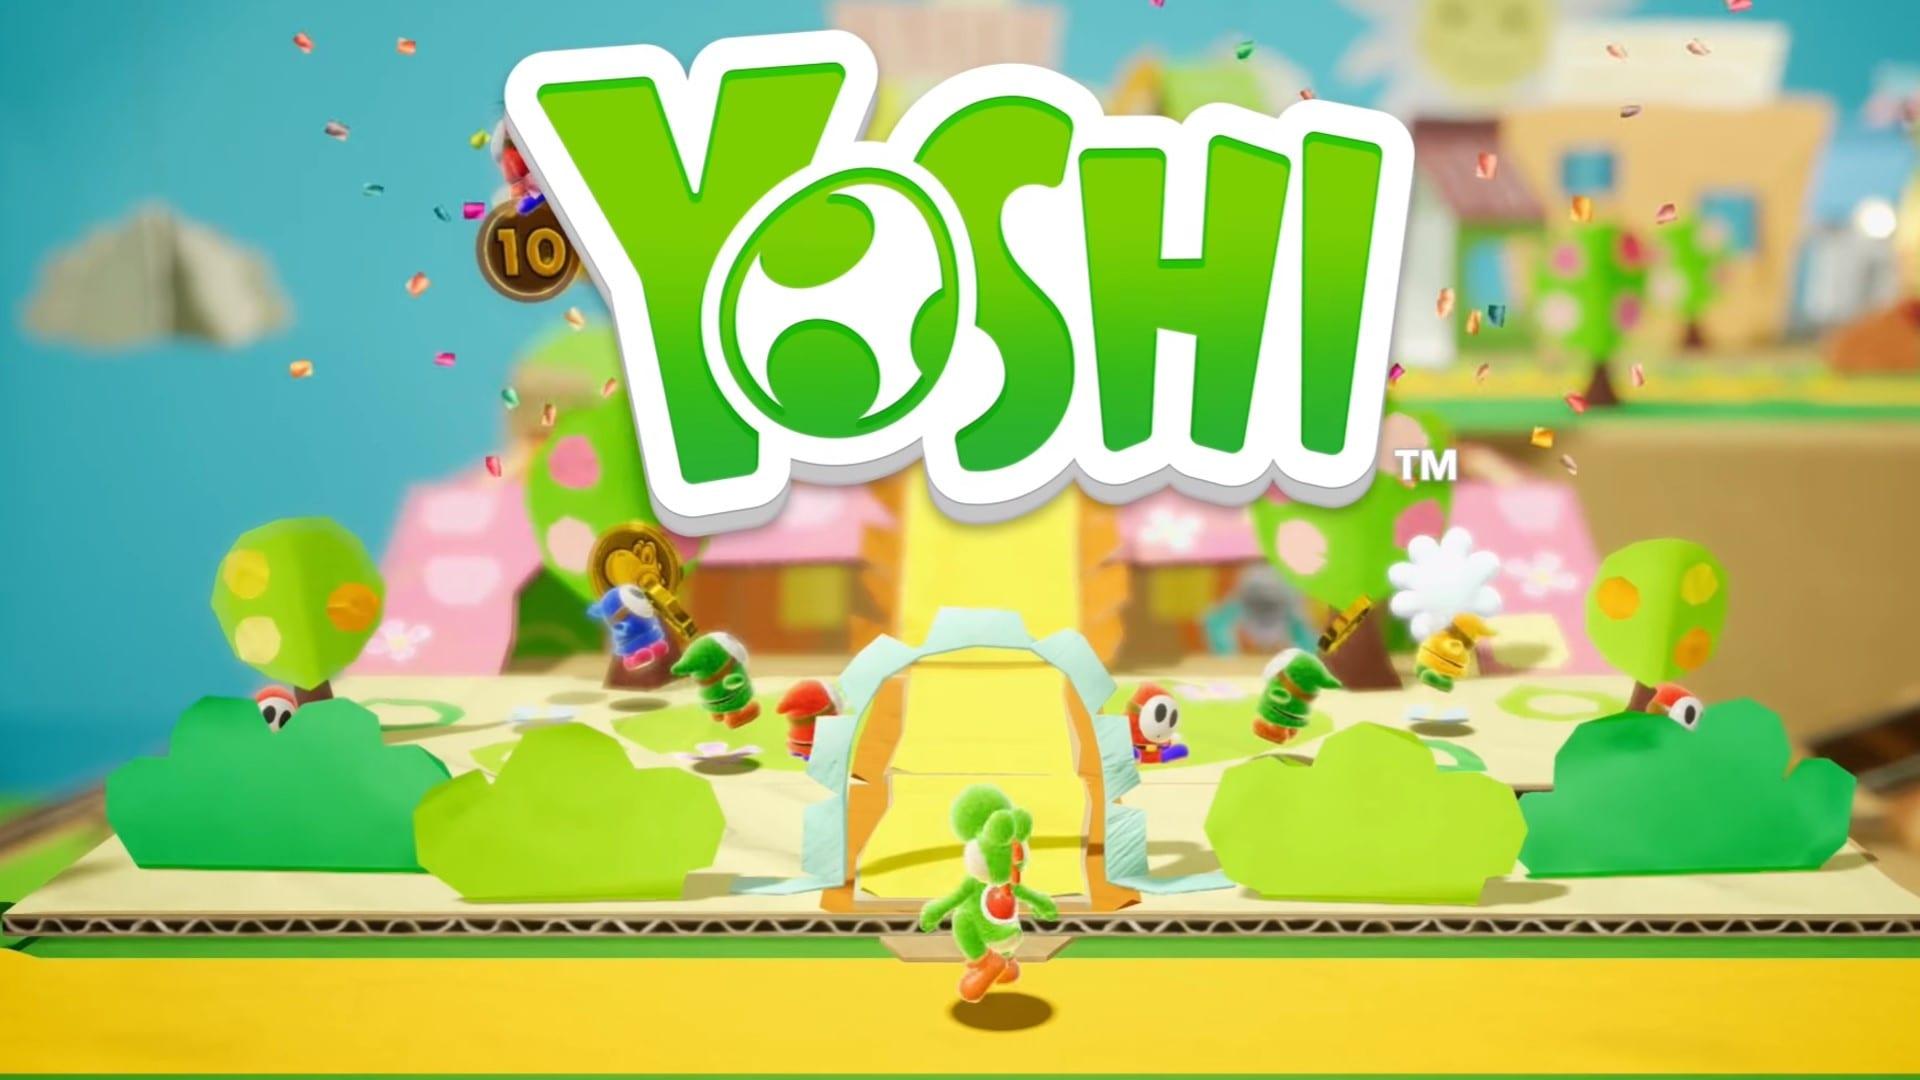 Yoshi Coming to Nintendo Switch in 2018